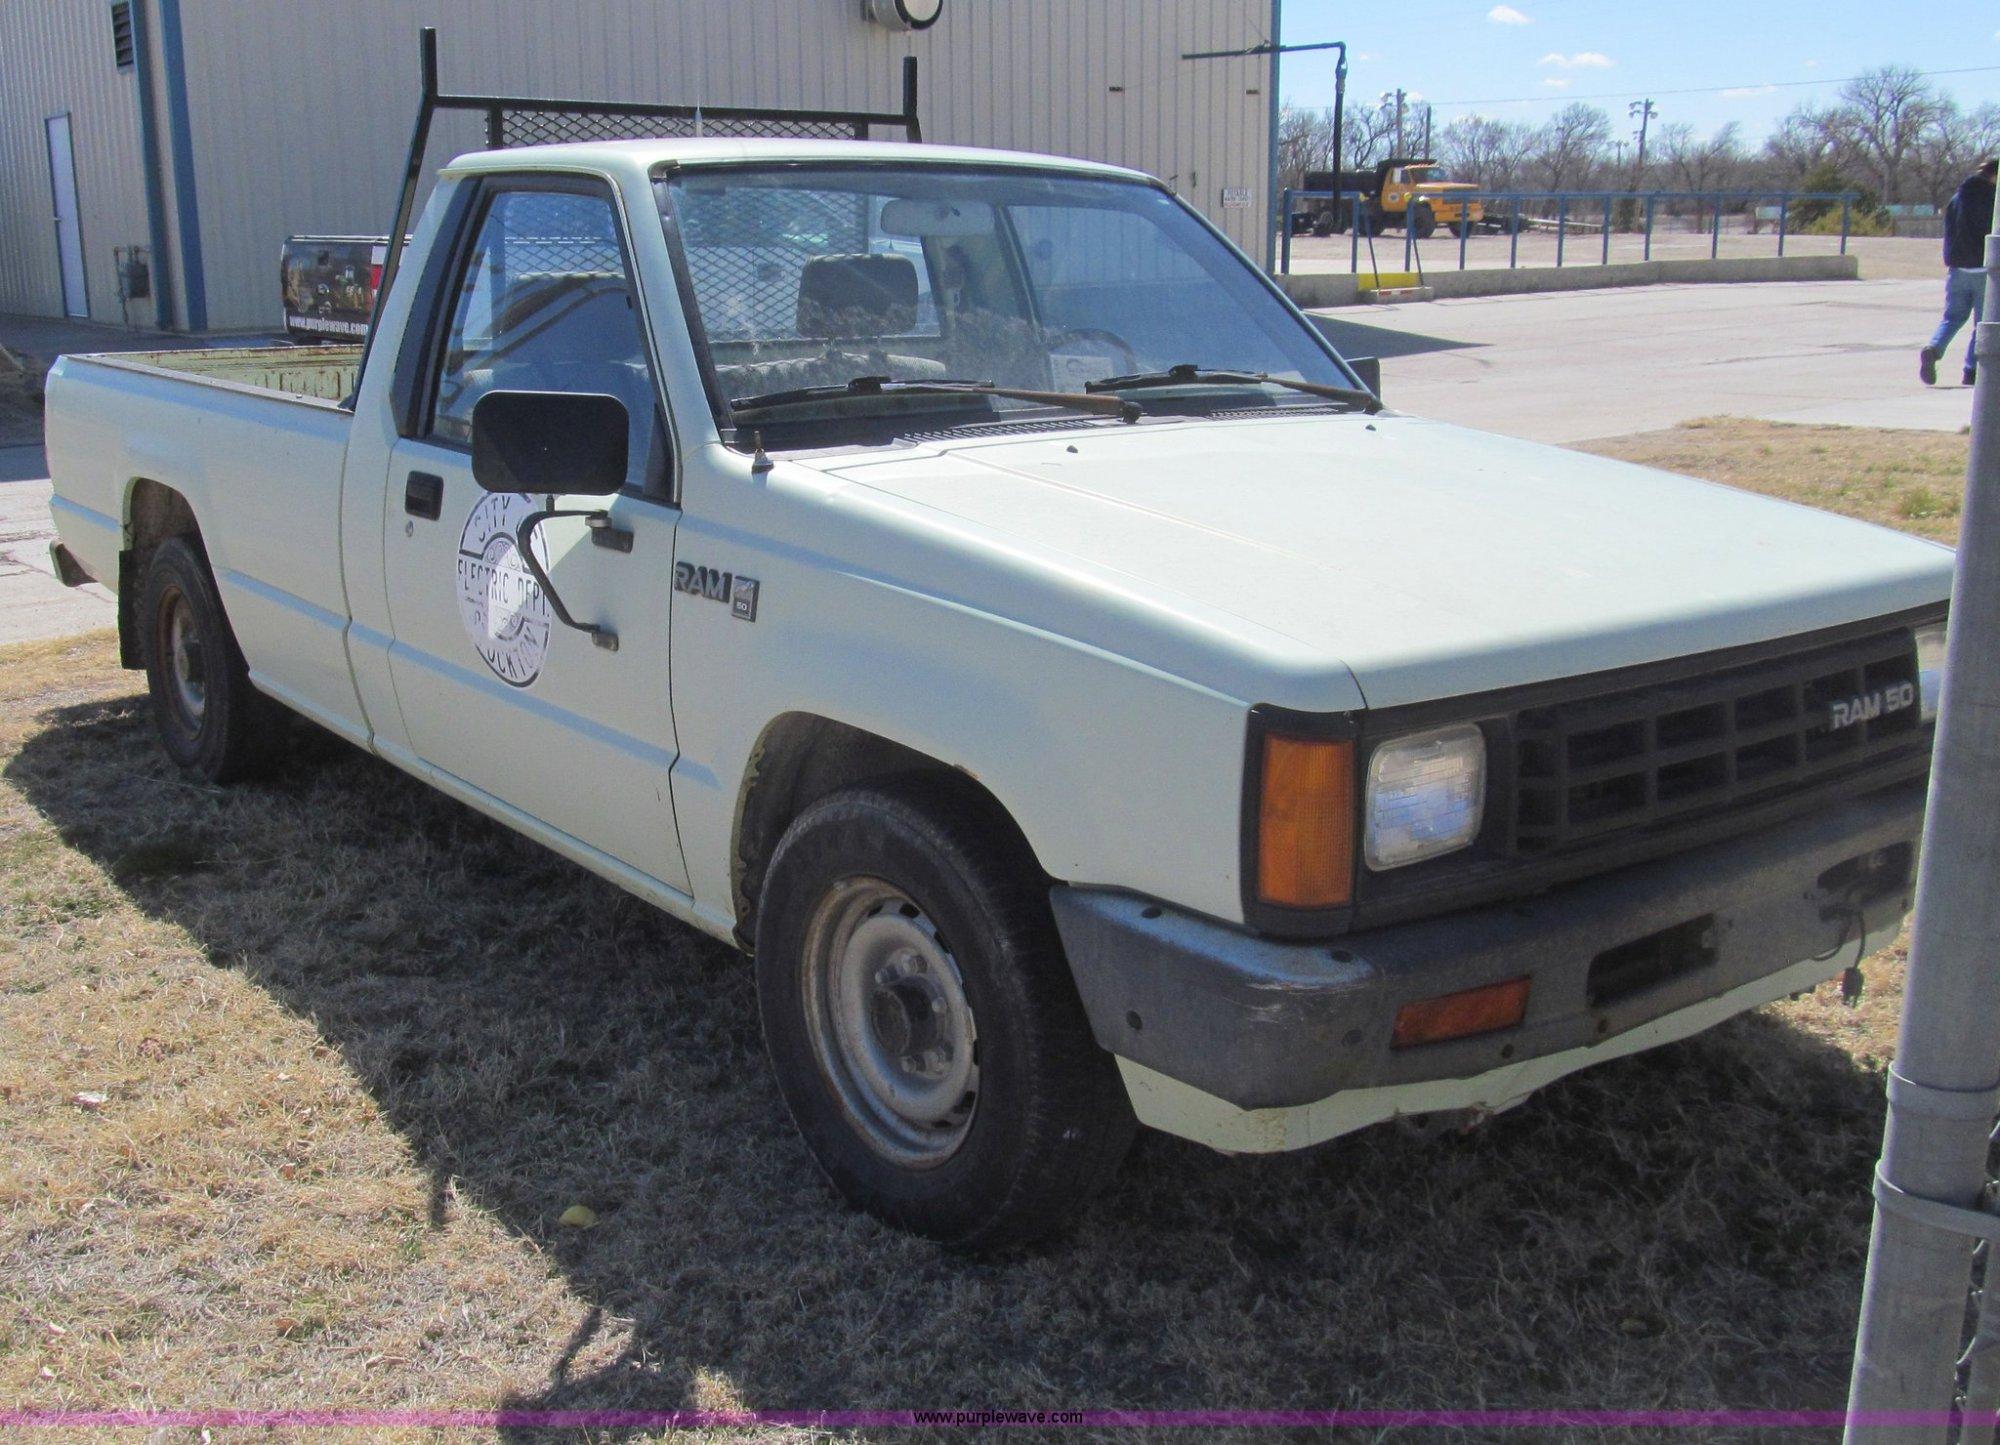 hight resolution of  1987 dodge ram 50 pickup truck full size in new window